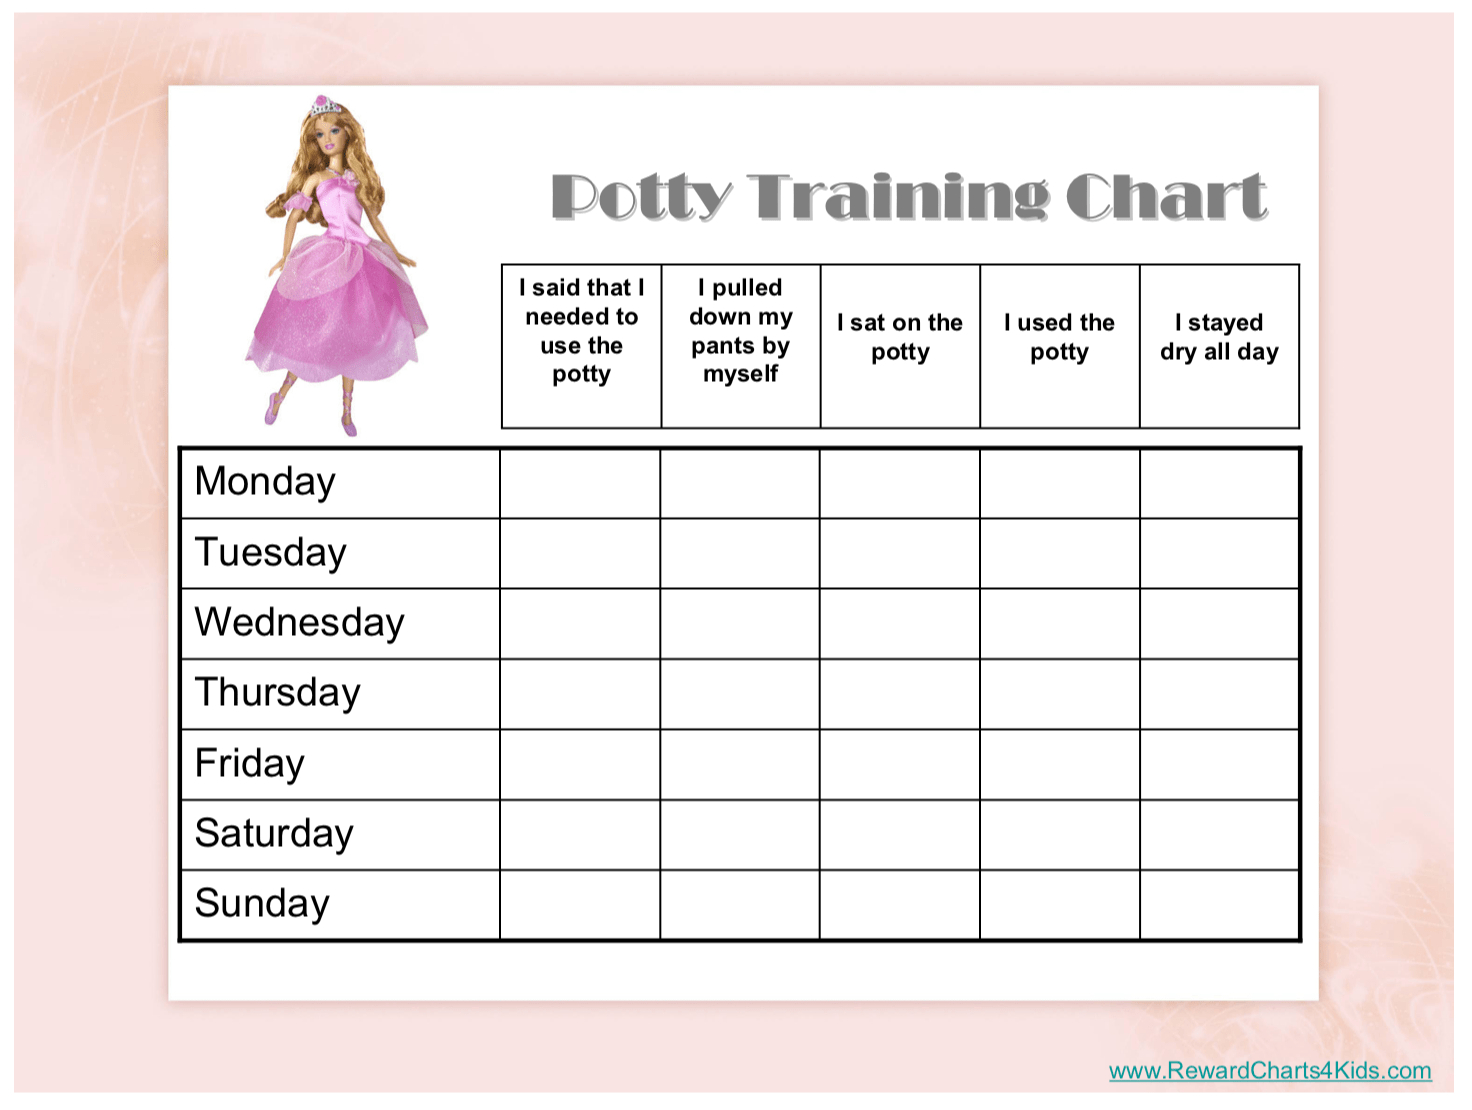 Free Printable Potty Training Charts - Potty Training - Free Printable Potty Charts